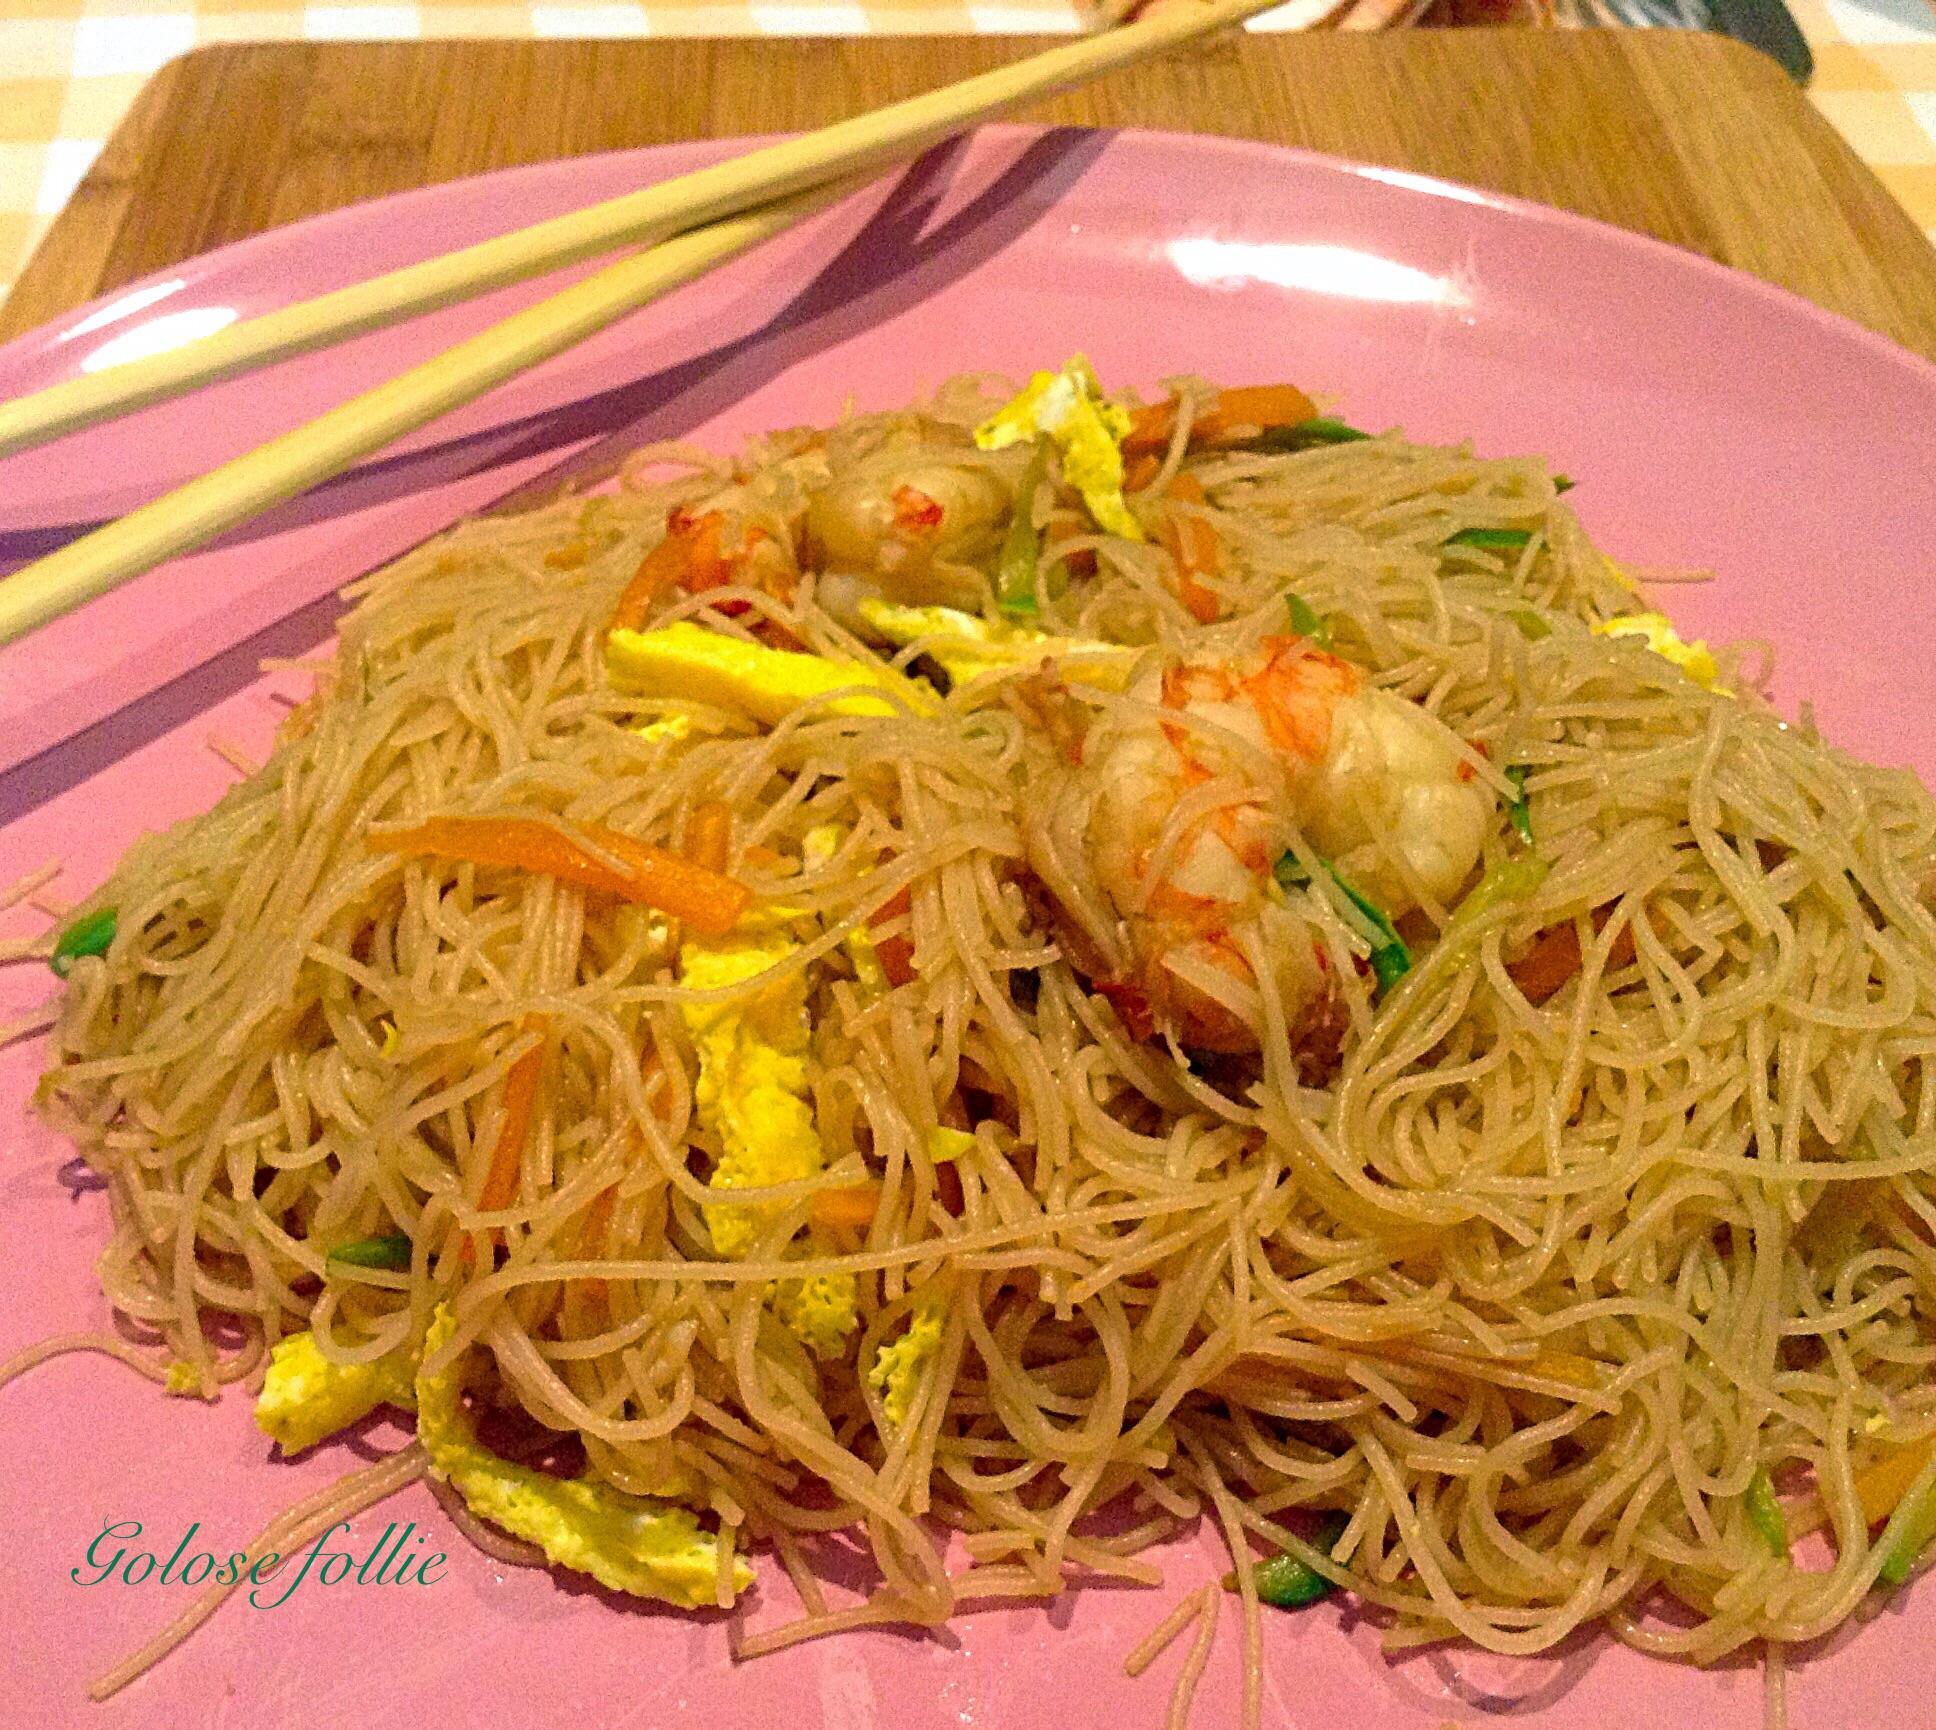 Ricetta spaghetti cinesi gamberi e verdure ricette for Gamberi alla piastra cinesi